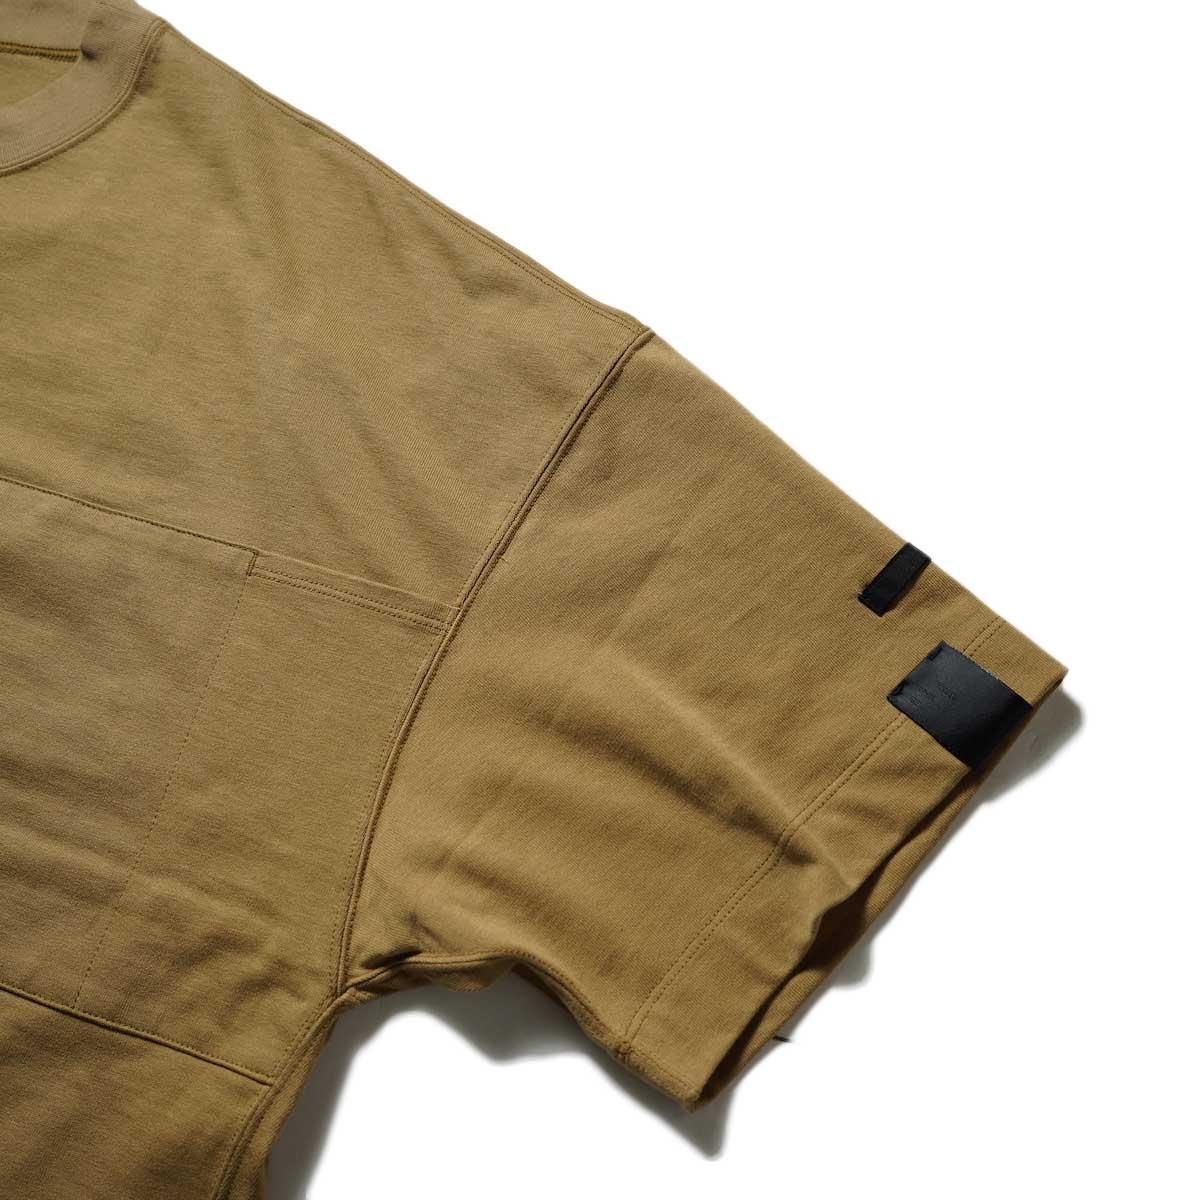 N.HOOLYWOOD / 2212-CS07-018 BIG T-Shirt (Beige)左袖